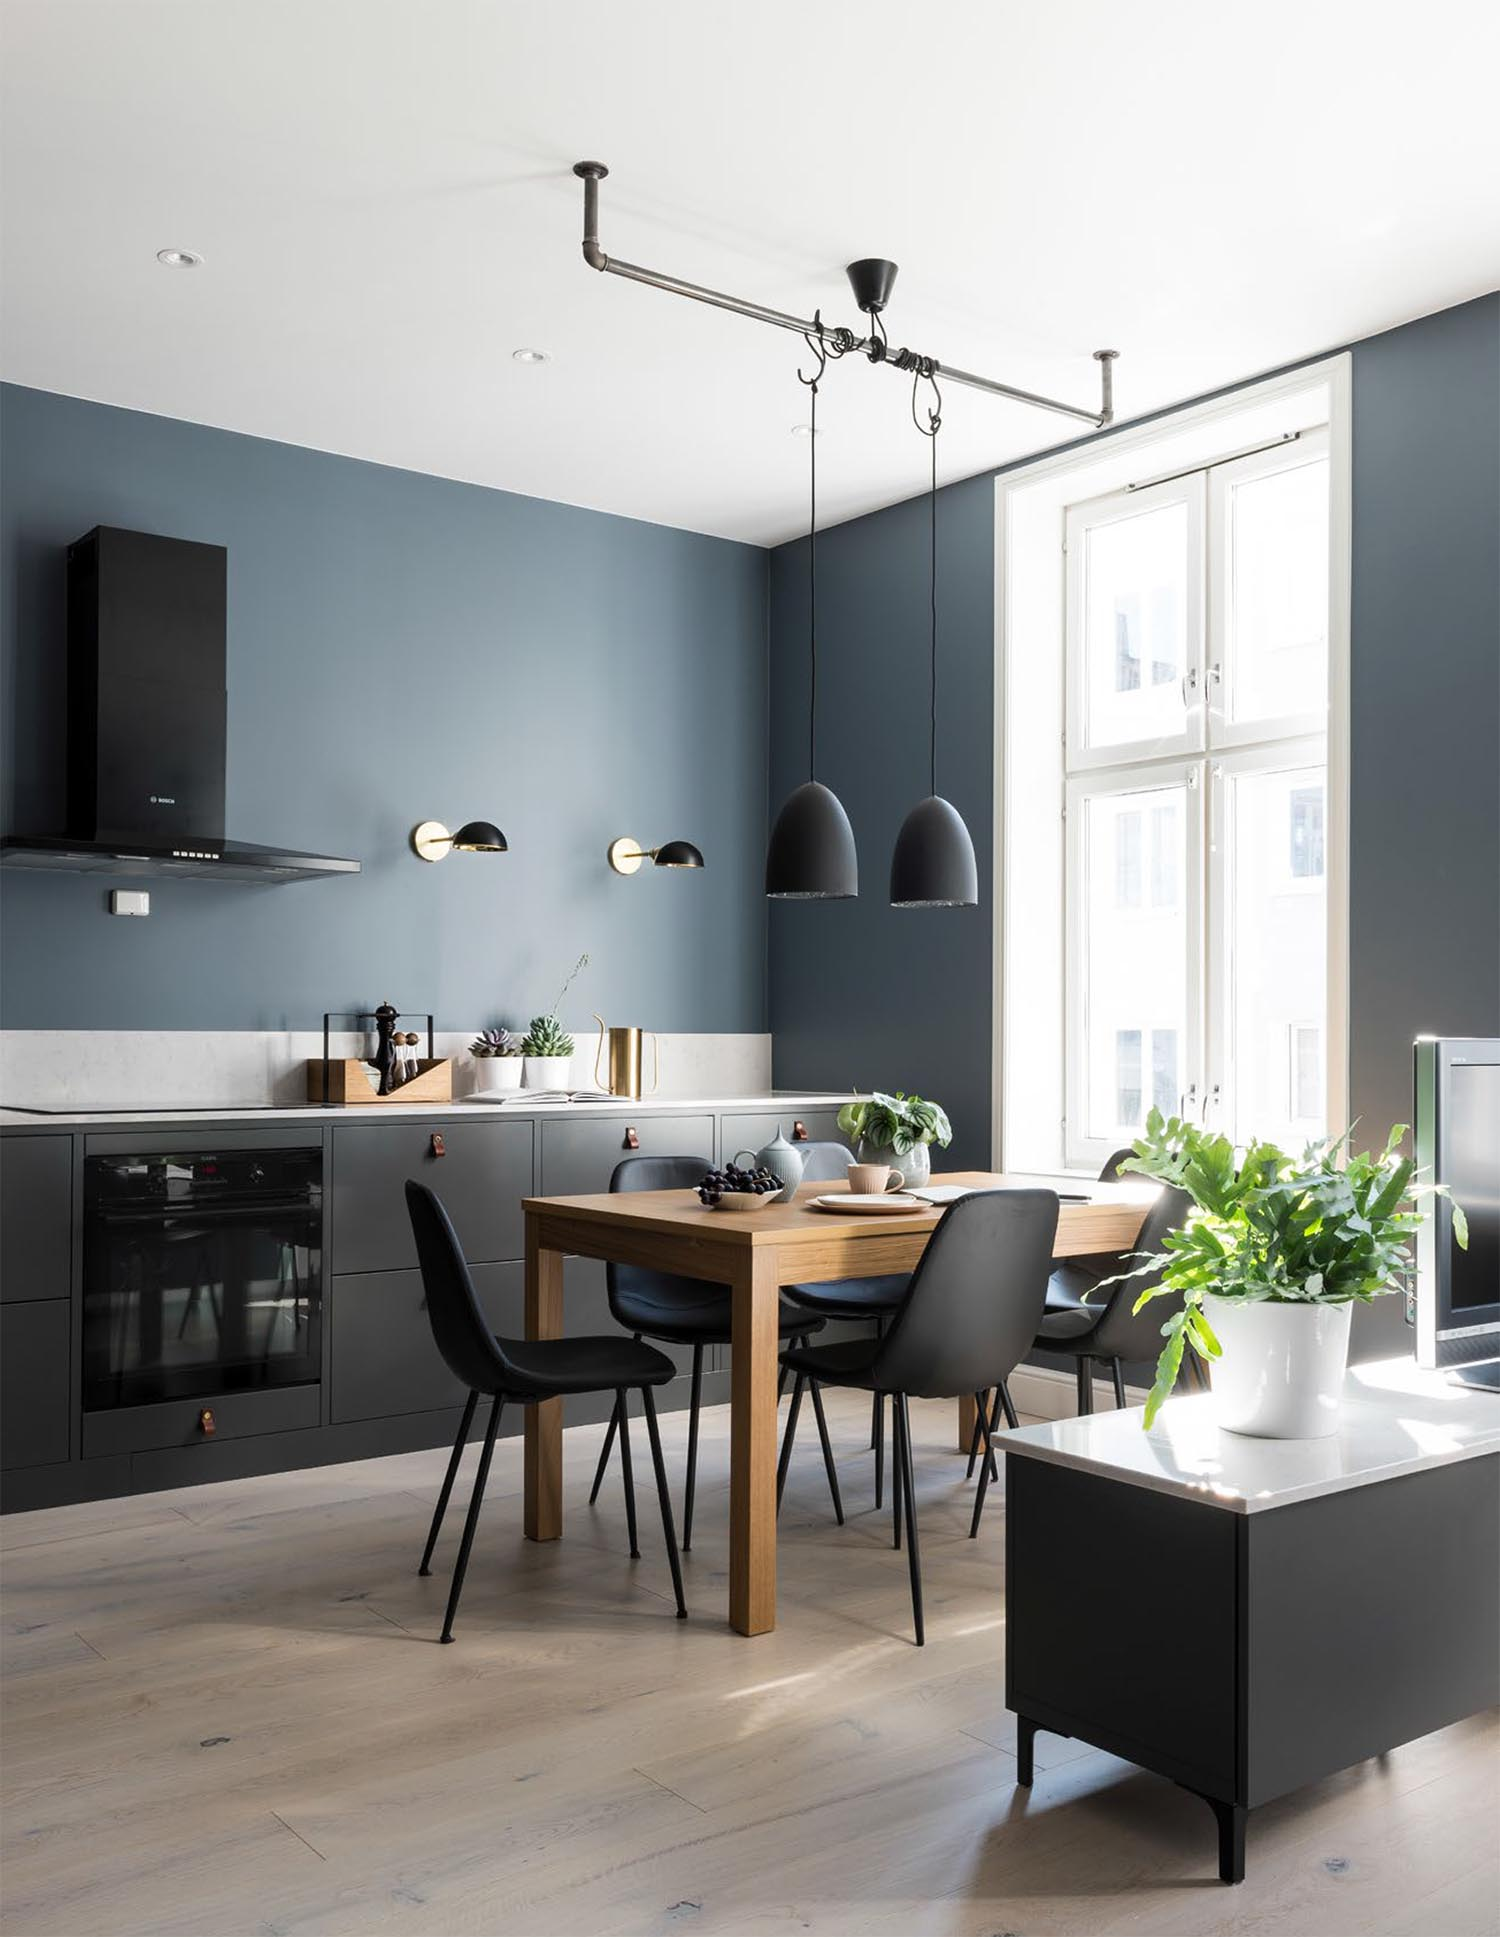 nil, kjøkken, interiør, interiørarkitektur